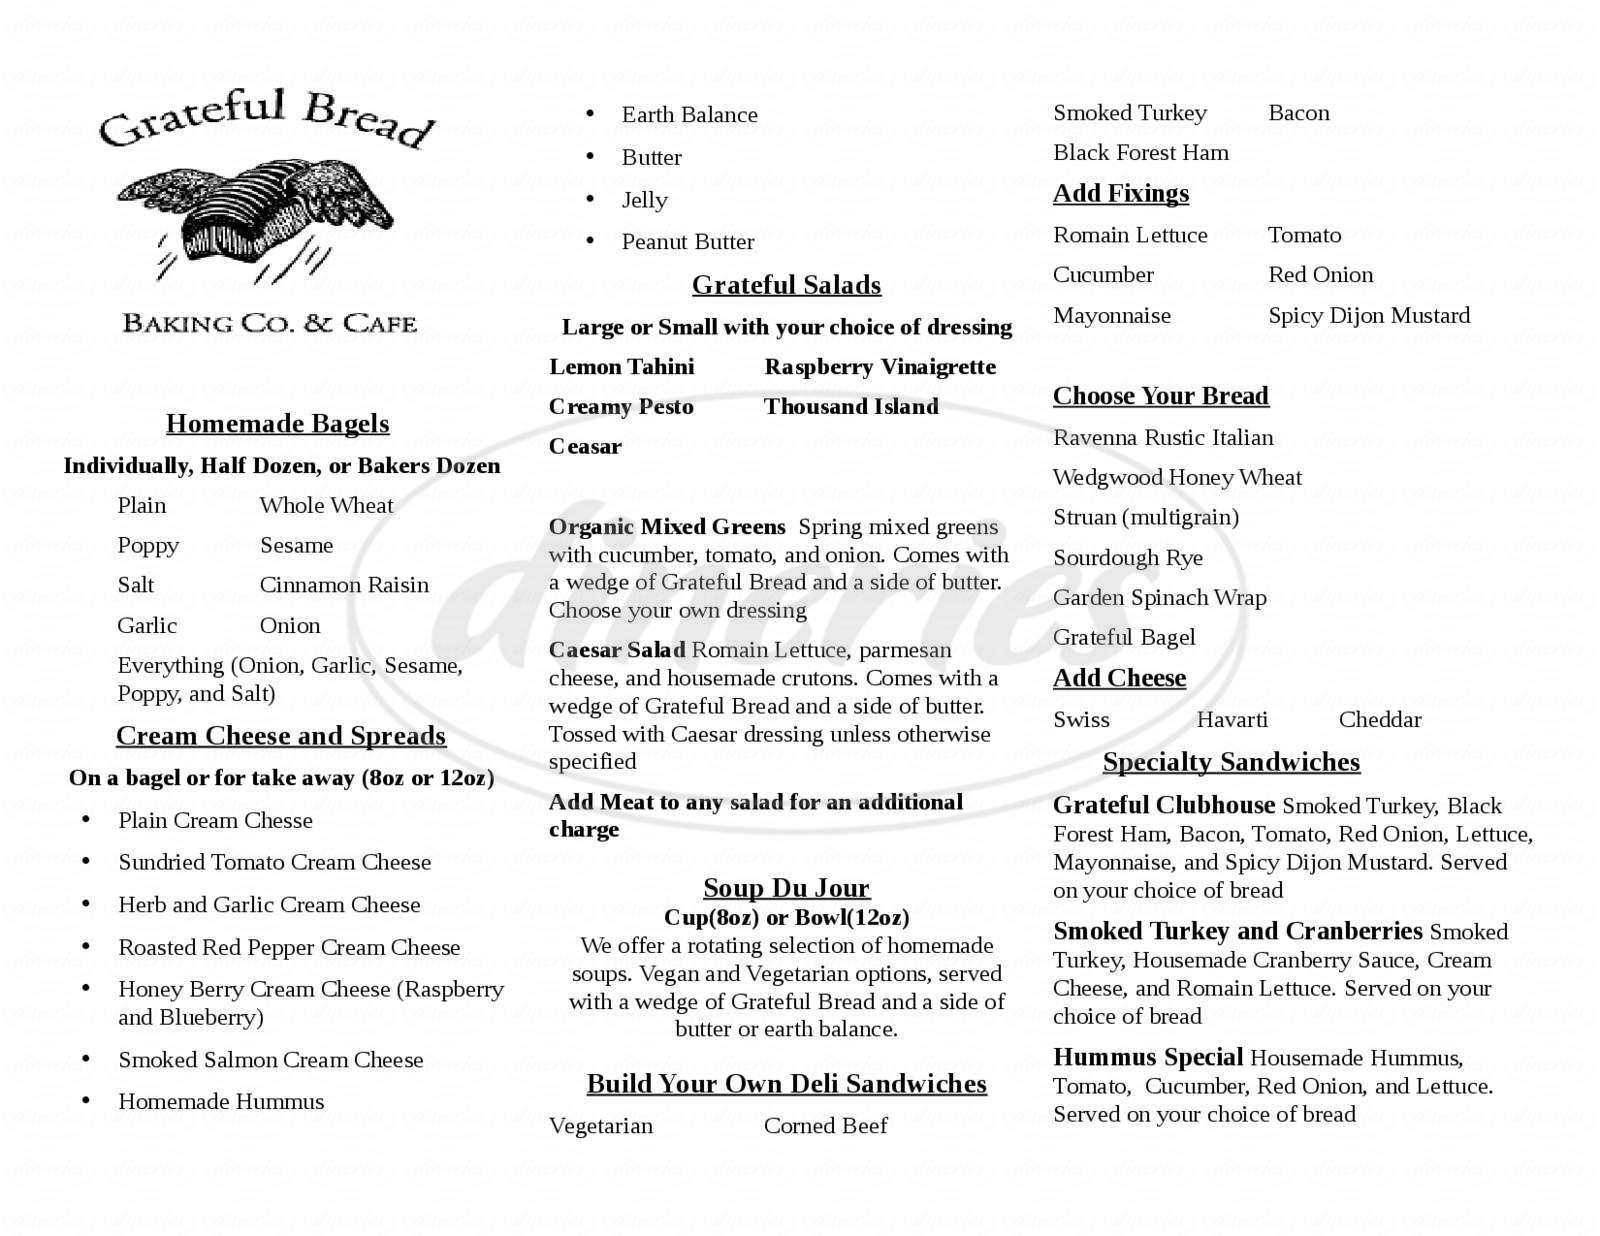 menu for Grateful Bread